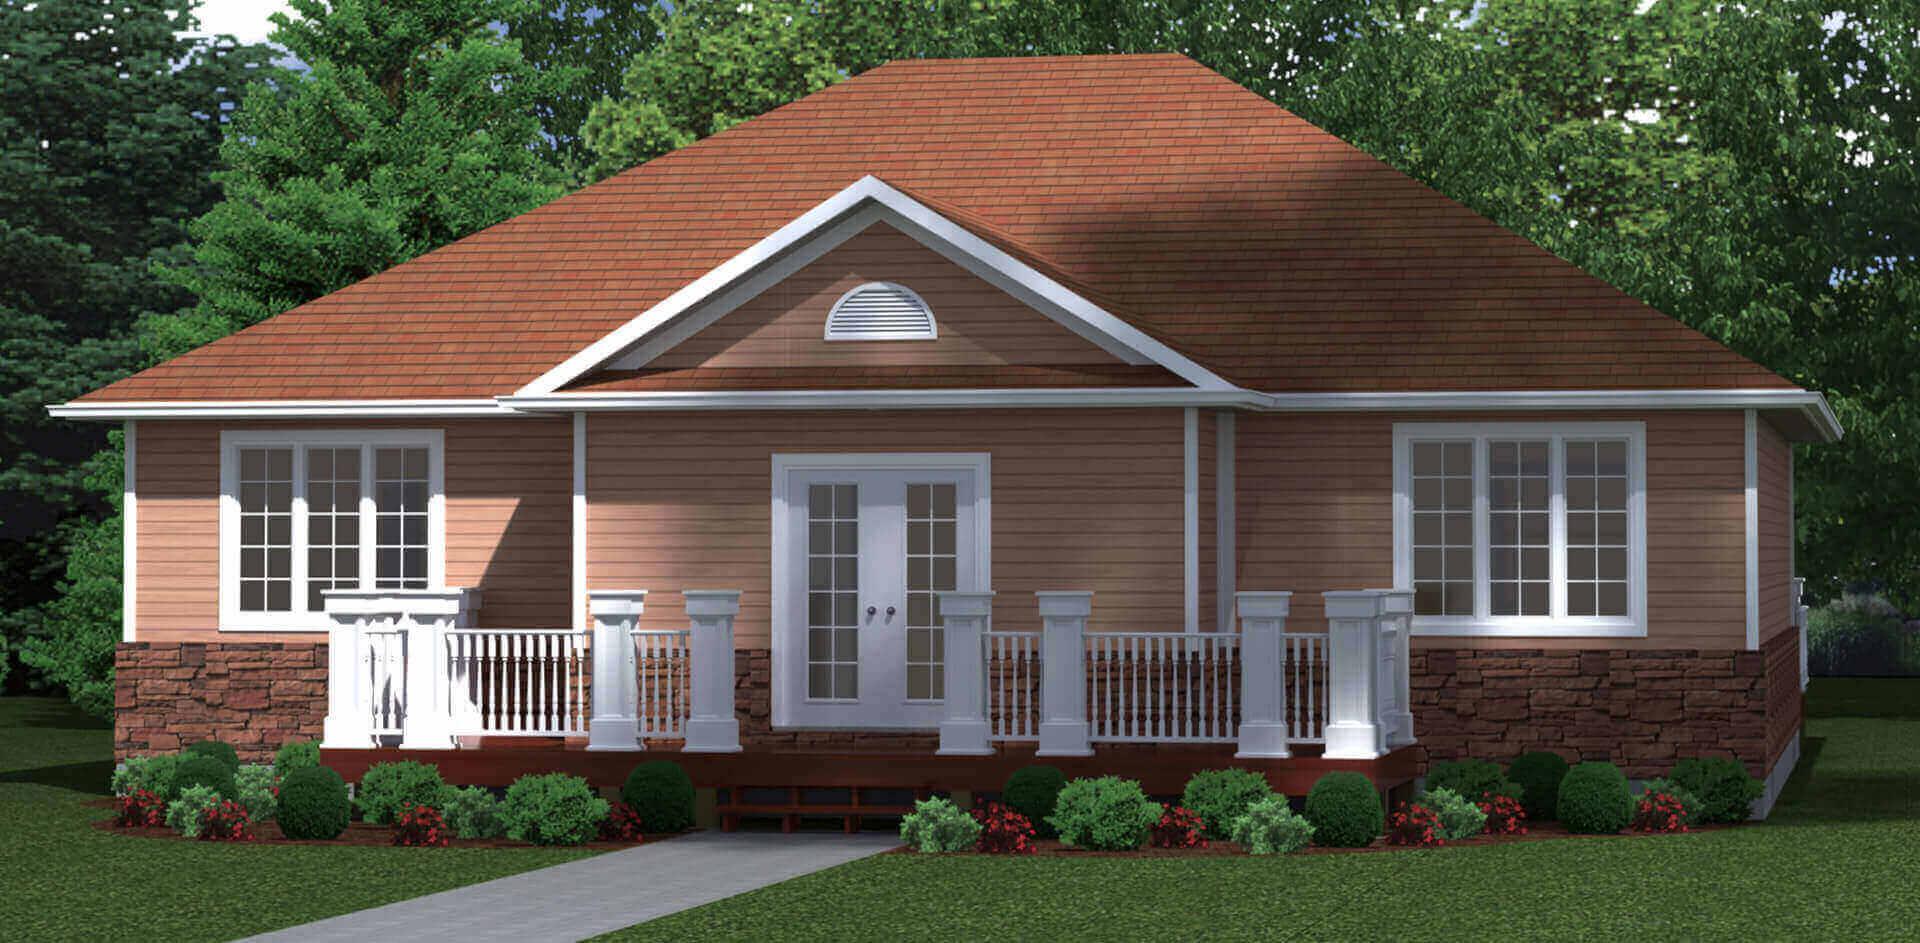 1772e house elevation